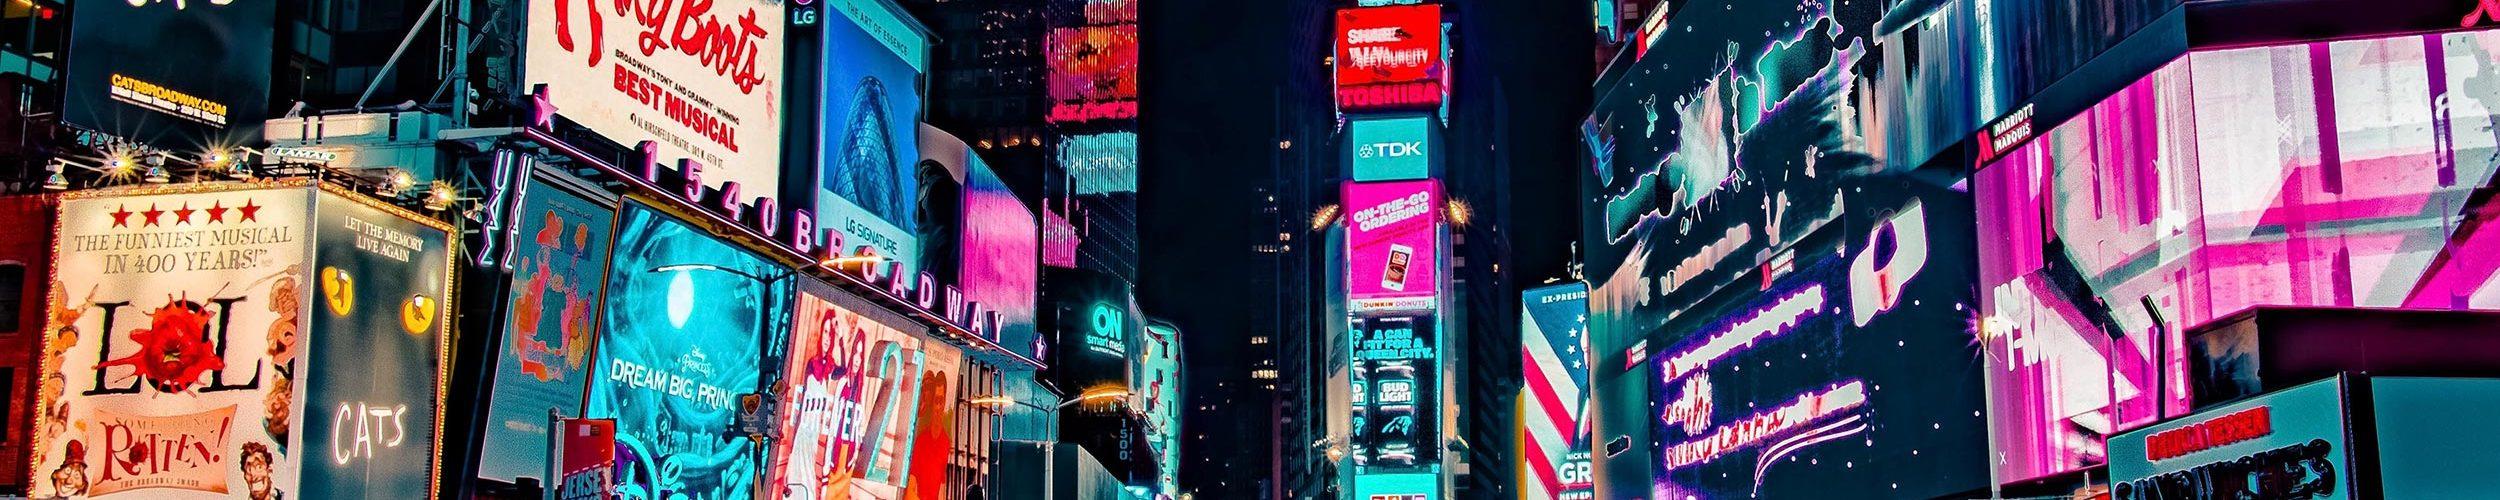 advertising_banner